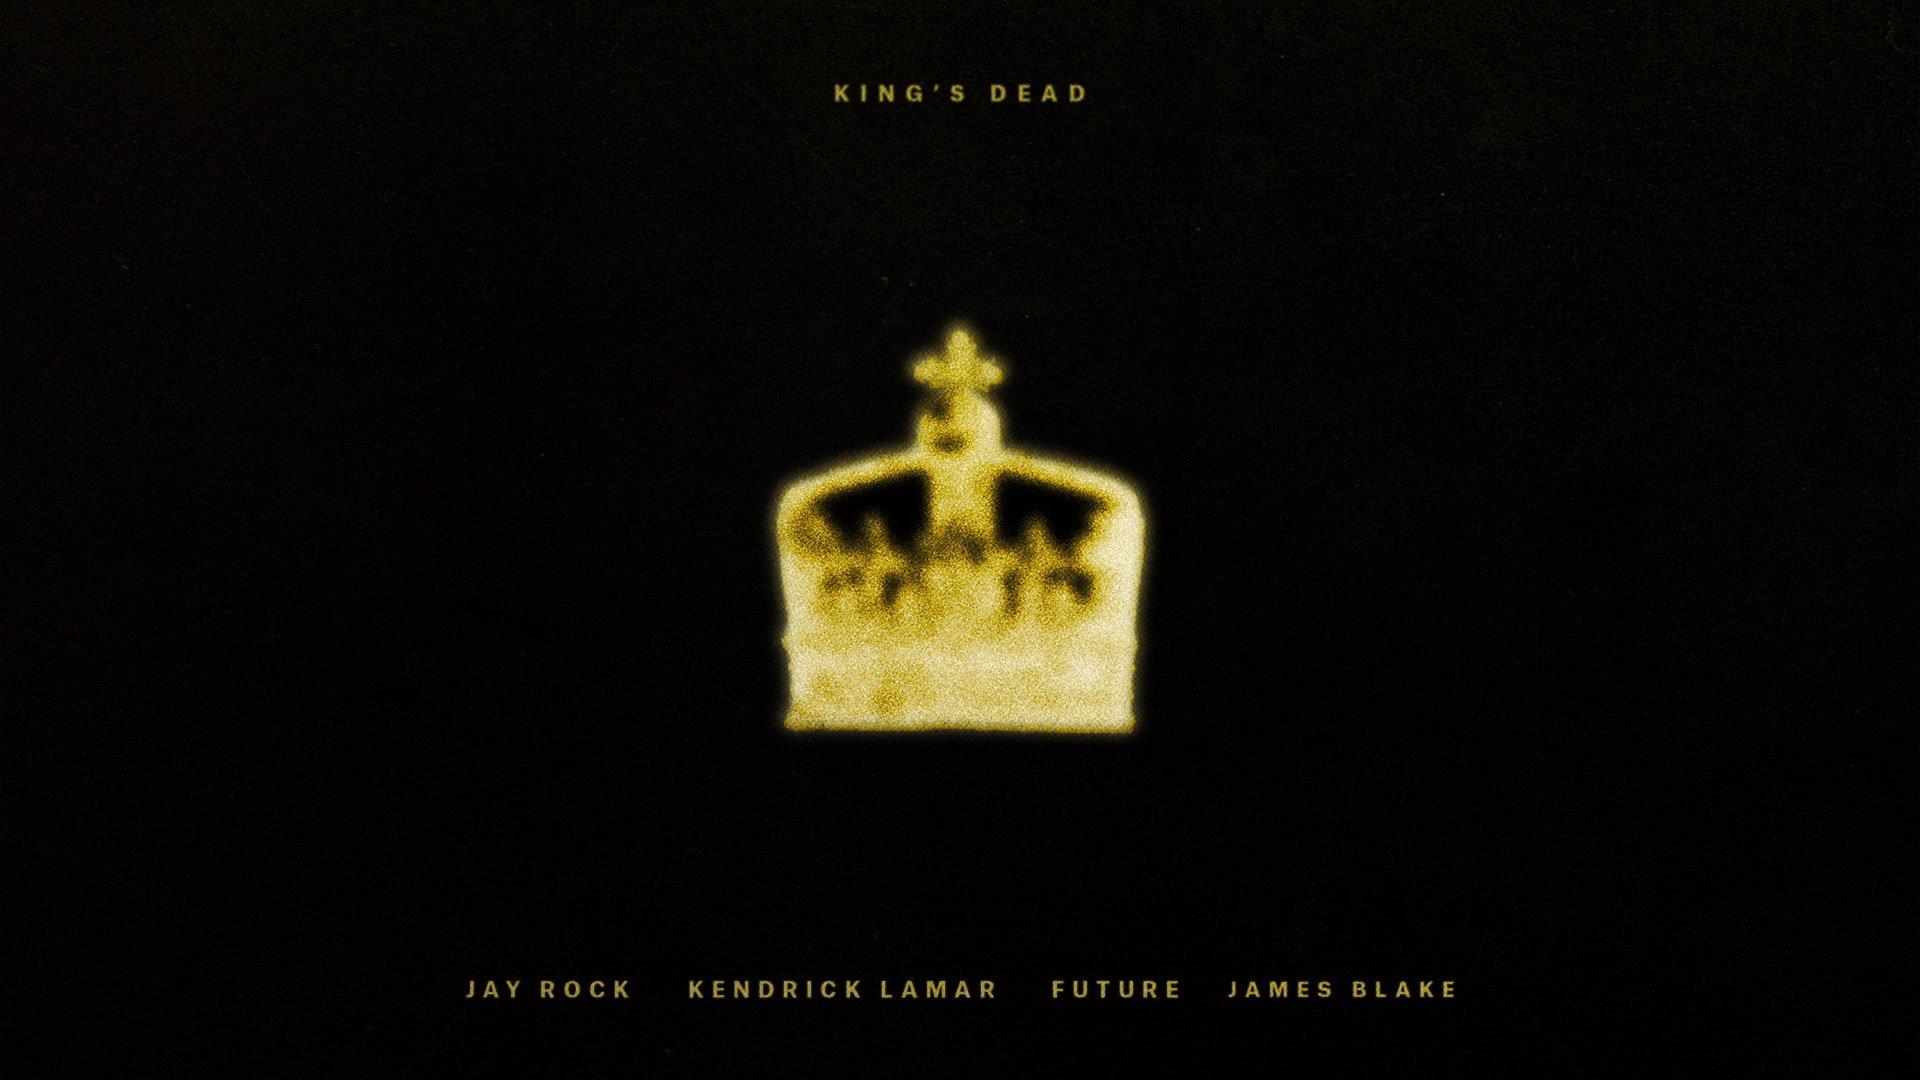 Kings dead pseudo video jay rock kendrick lamar future kings dead pseudo video jay rock kendrick lamar future james blake vevo voltagebd Choice Image